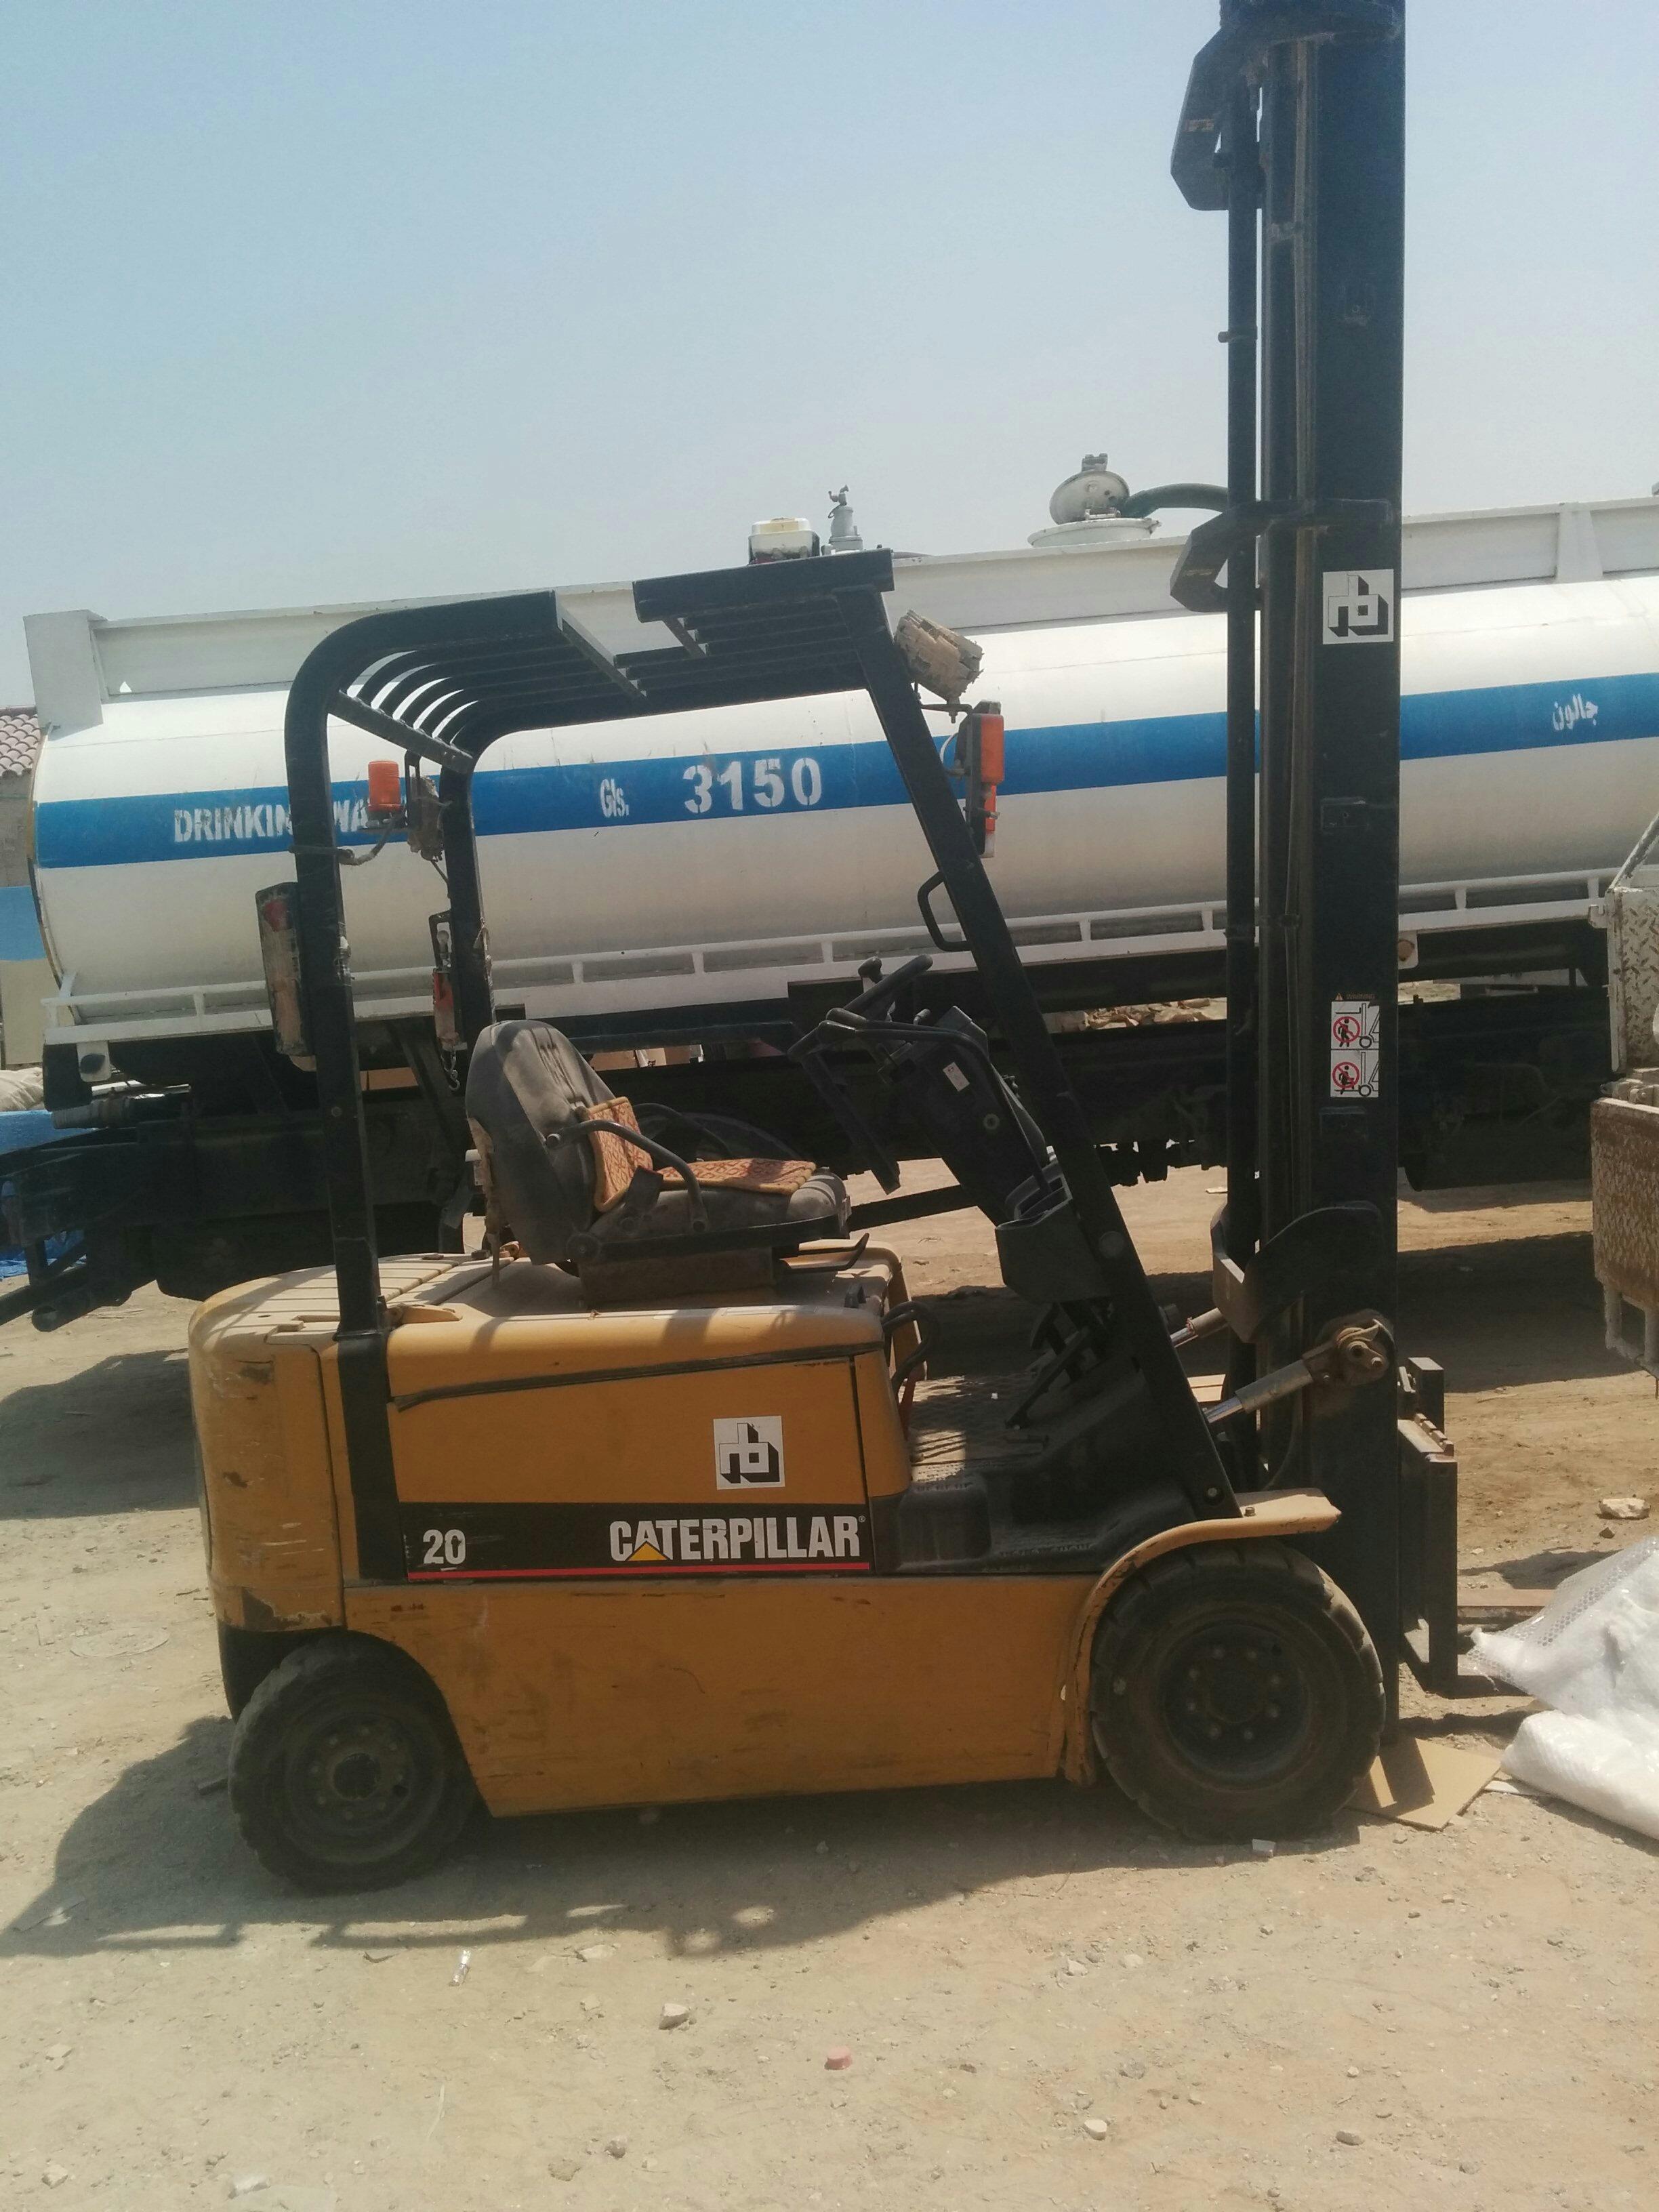 Caterpillar Forklift for Sale | Qatar Living